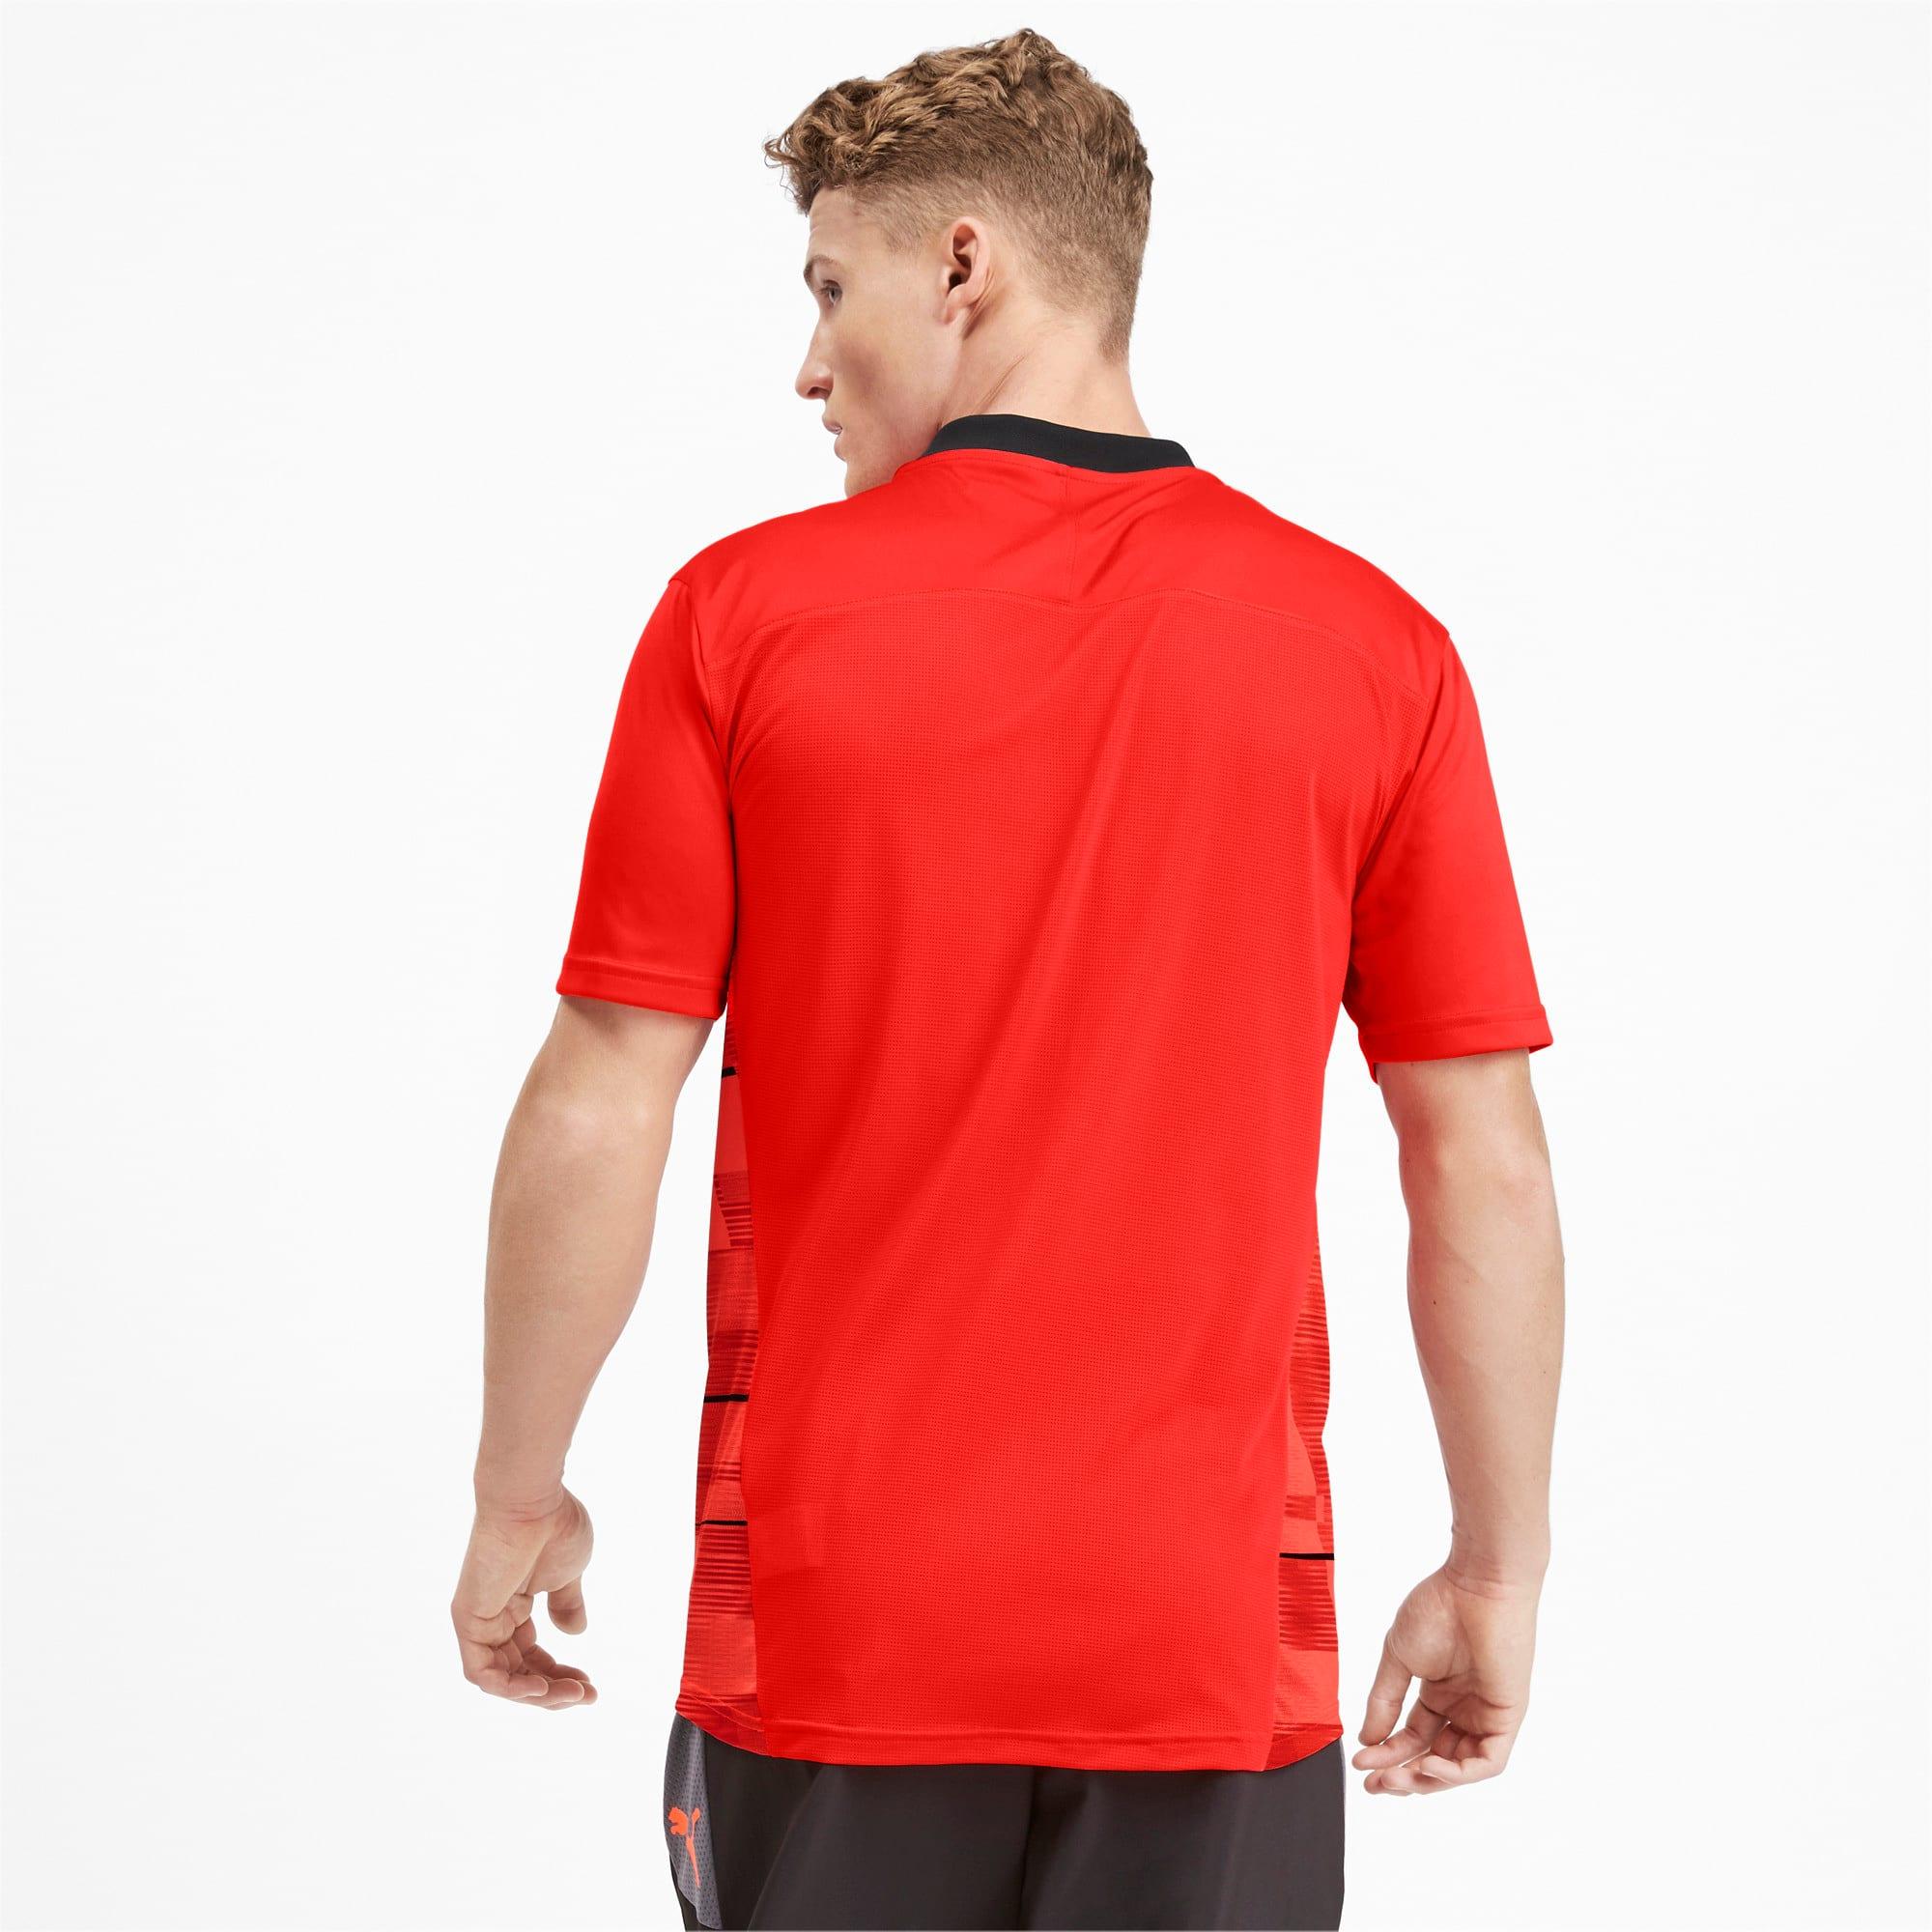 Thumbnail 2 of ftblNXT Men's Graphic Shirt, Nrgy Red-Puma Black, medium